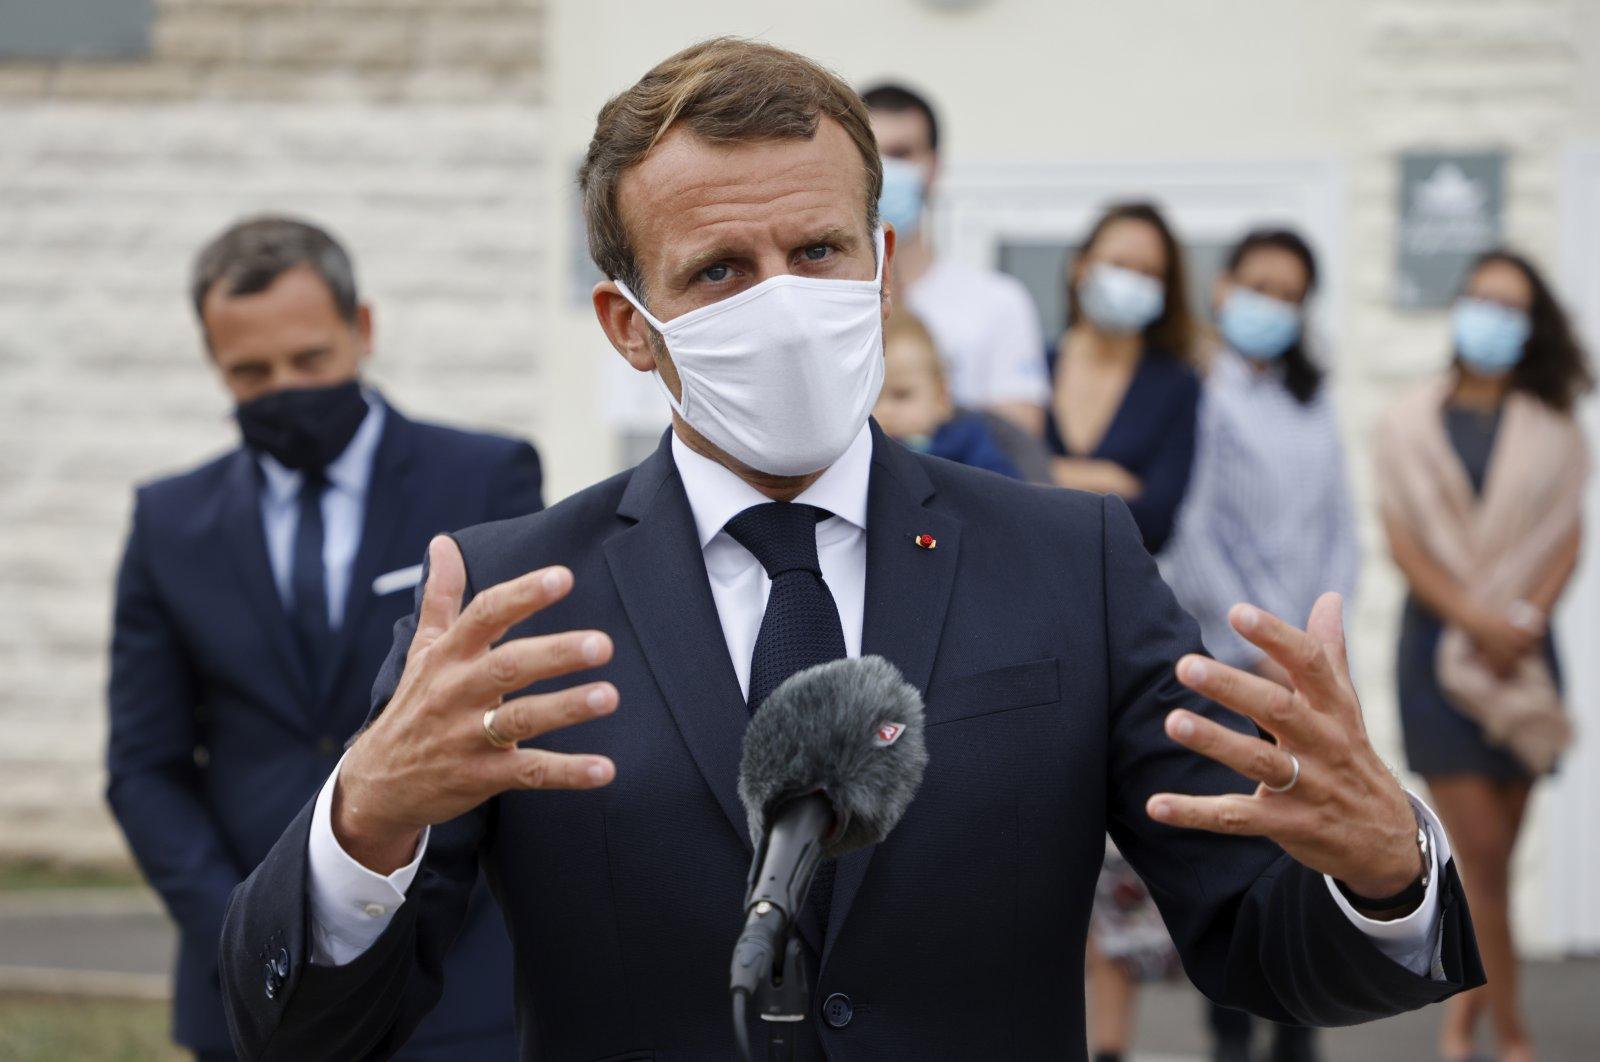 French President Emmanuel Macron speaks in Longjumeau, a southern suburb of Paris, Sept. 23, 2020. (AP Photo)